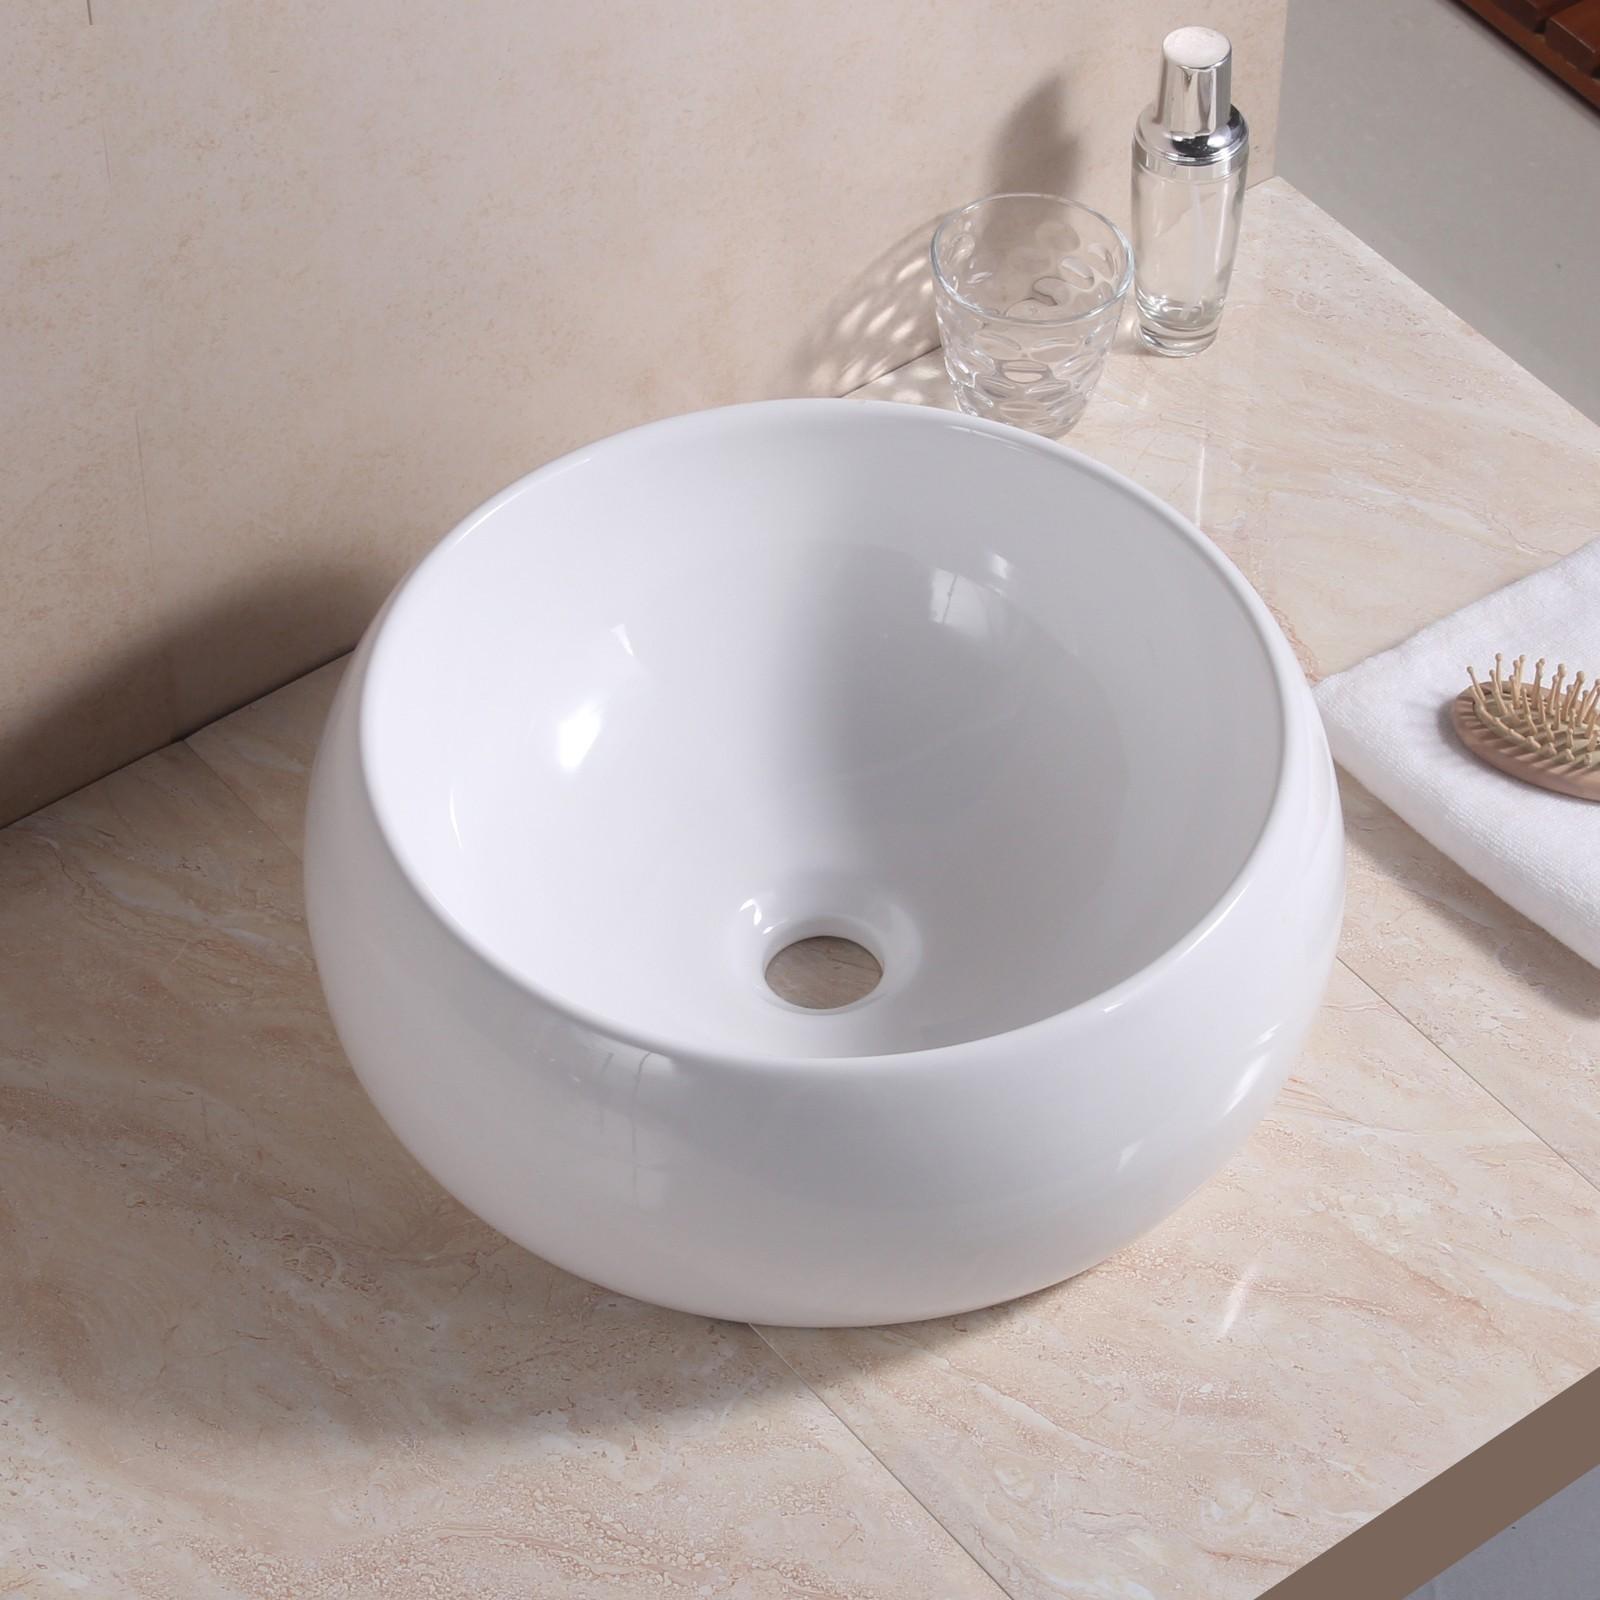 White round basin sink bathroom cloakroom ceramic counter for Wash basin bathroom sink